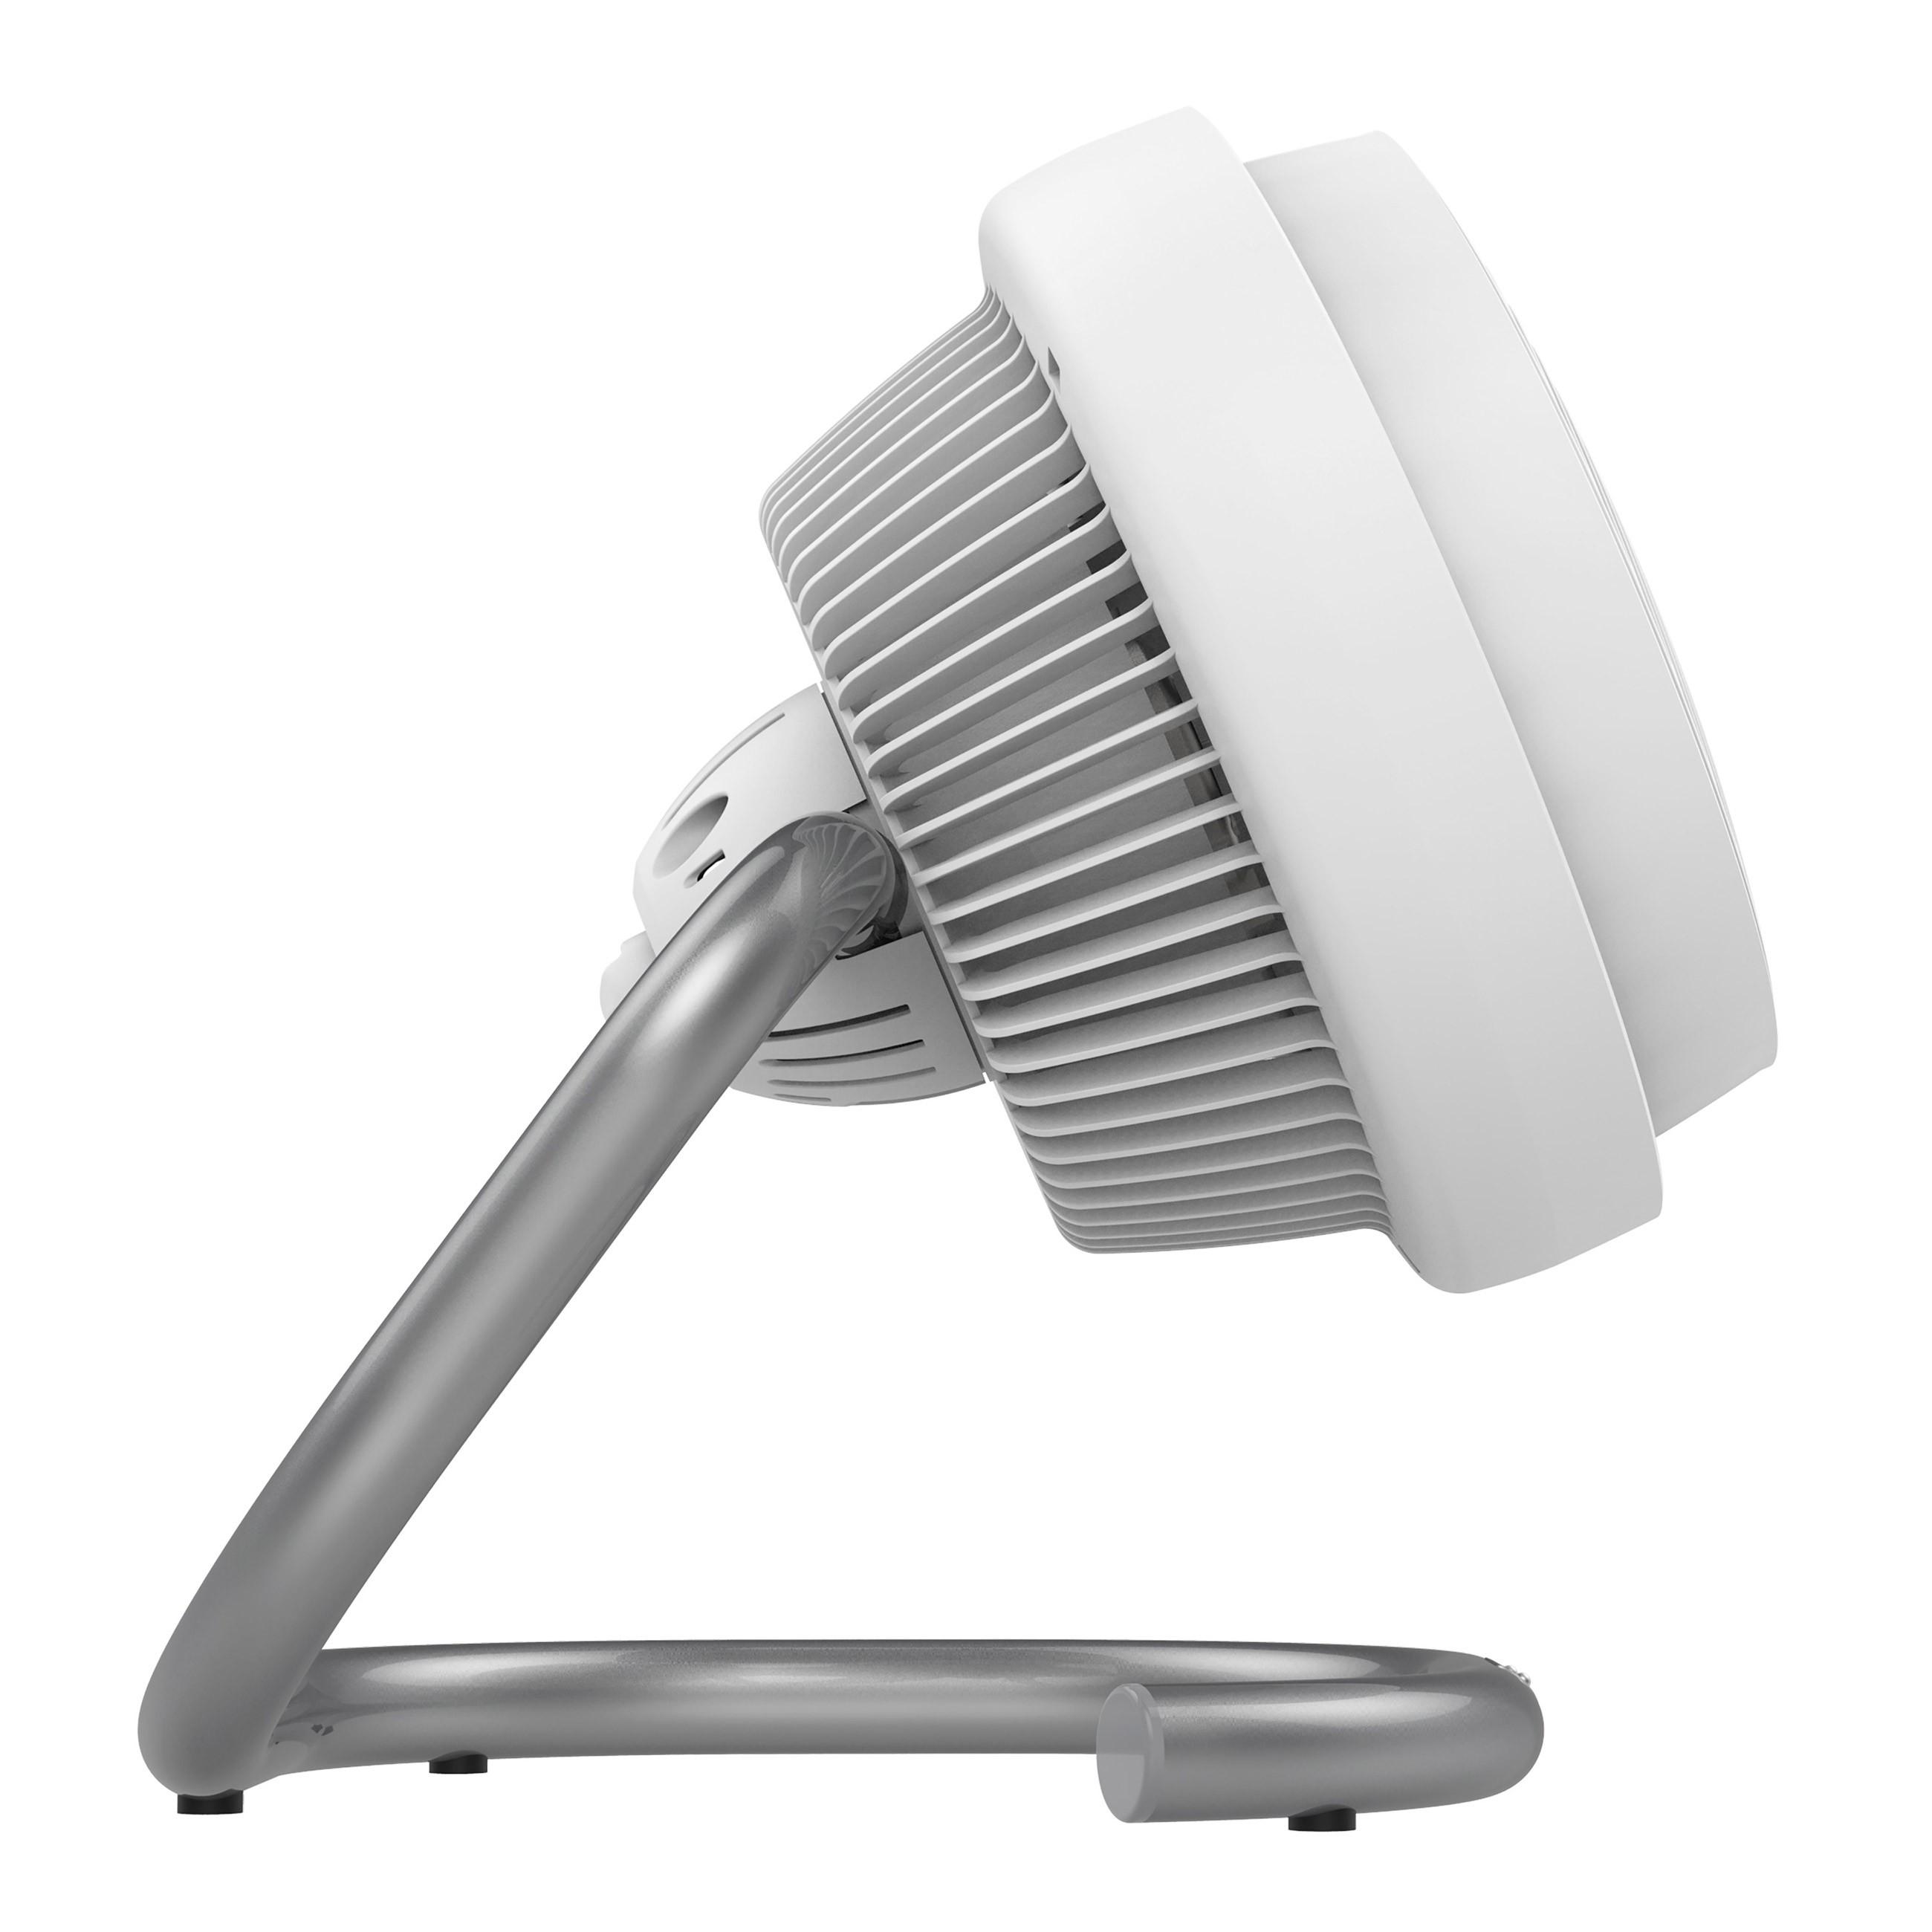 Ventilator / Bodenventilator Vornado Energy Smart 723DC Ø30cm Bild 2